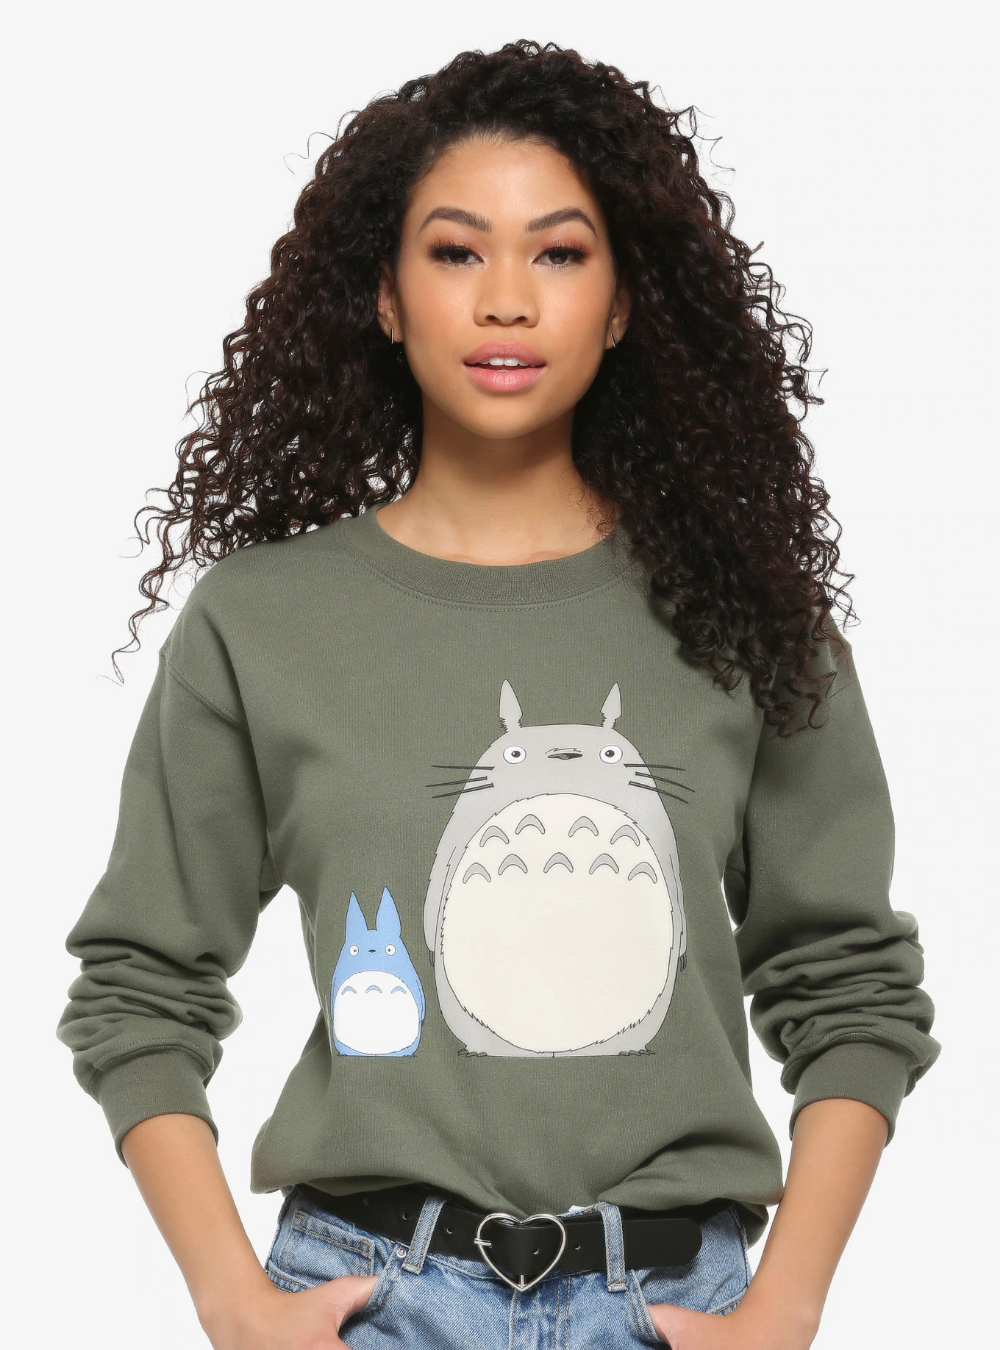 Studio Ghibli My Neighbor Totoro Forest Spirits Girls Sweatshirt Girl Sweatshirts My Neighbor Totoro Forest Spirit [ 1350 x 1000 Pixel ]